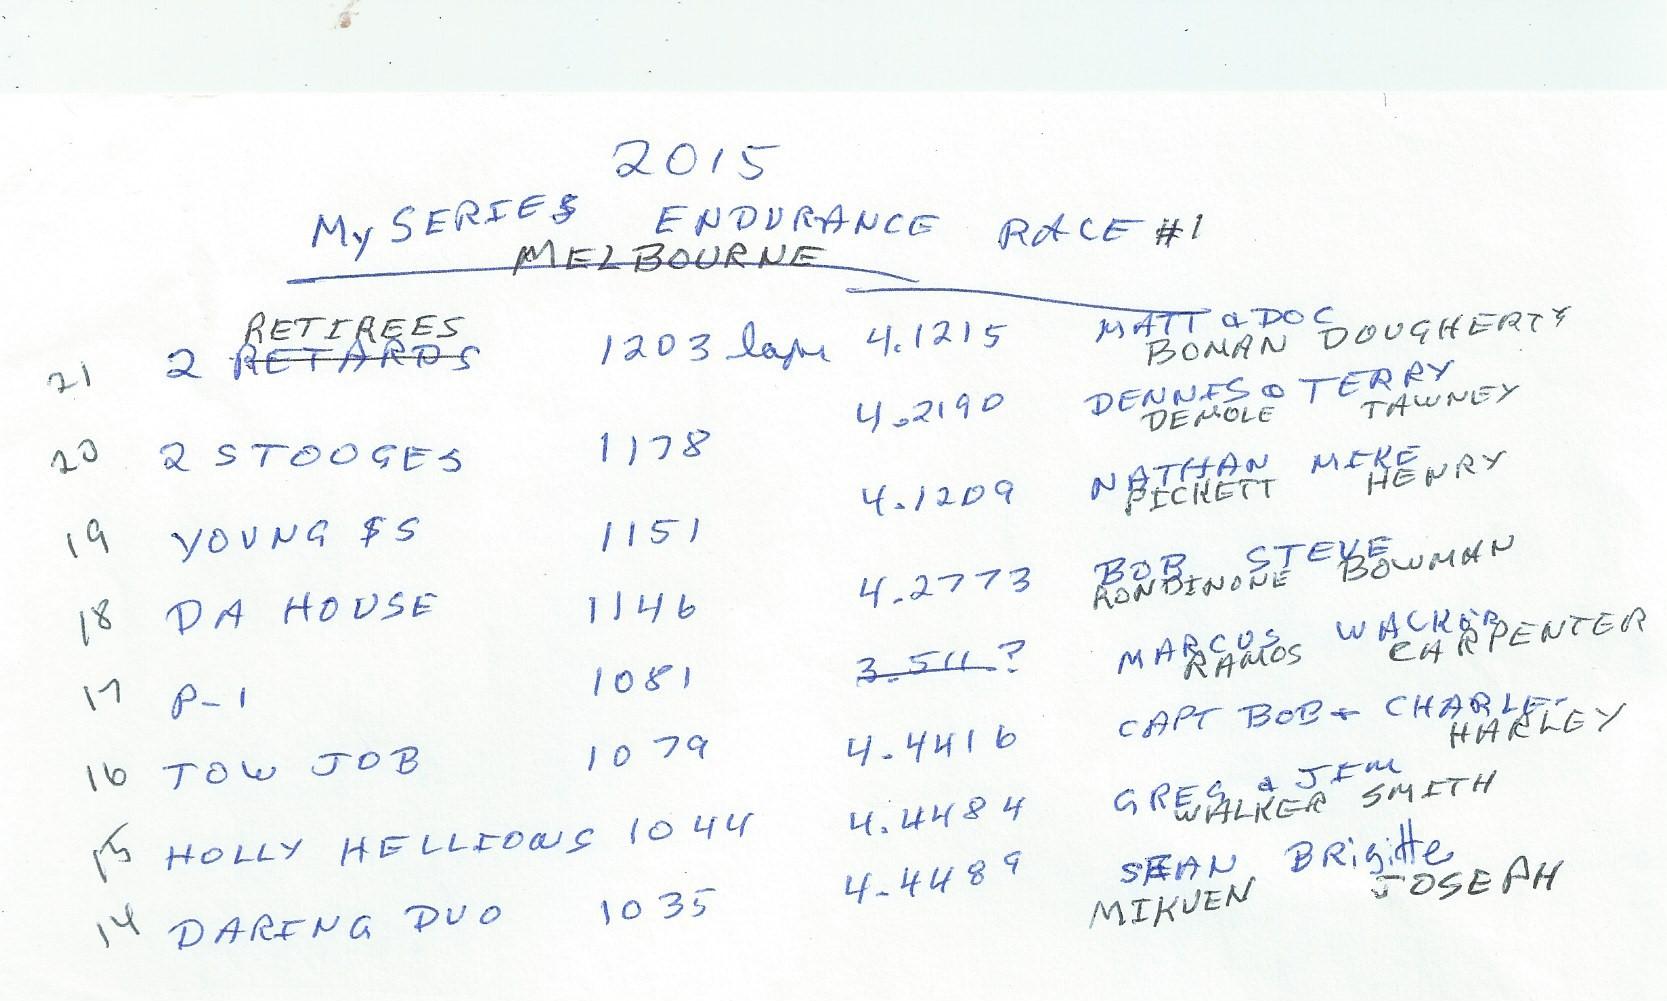 MS Enduro race results Melbourne 9-12-2015.jpg